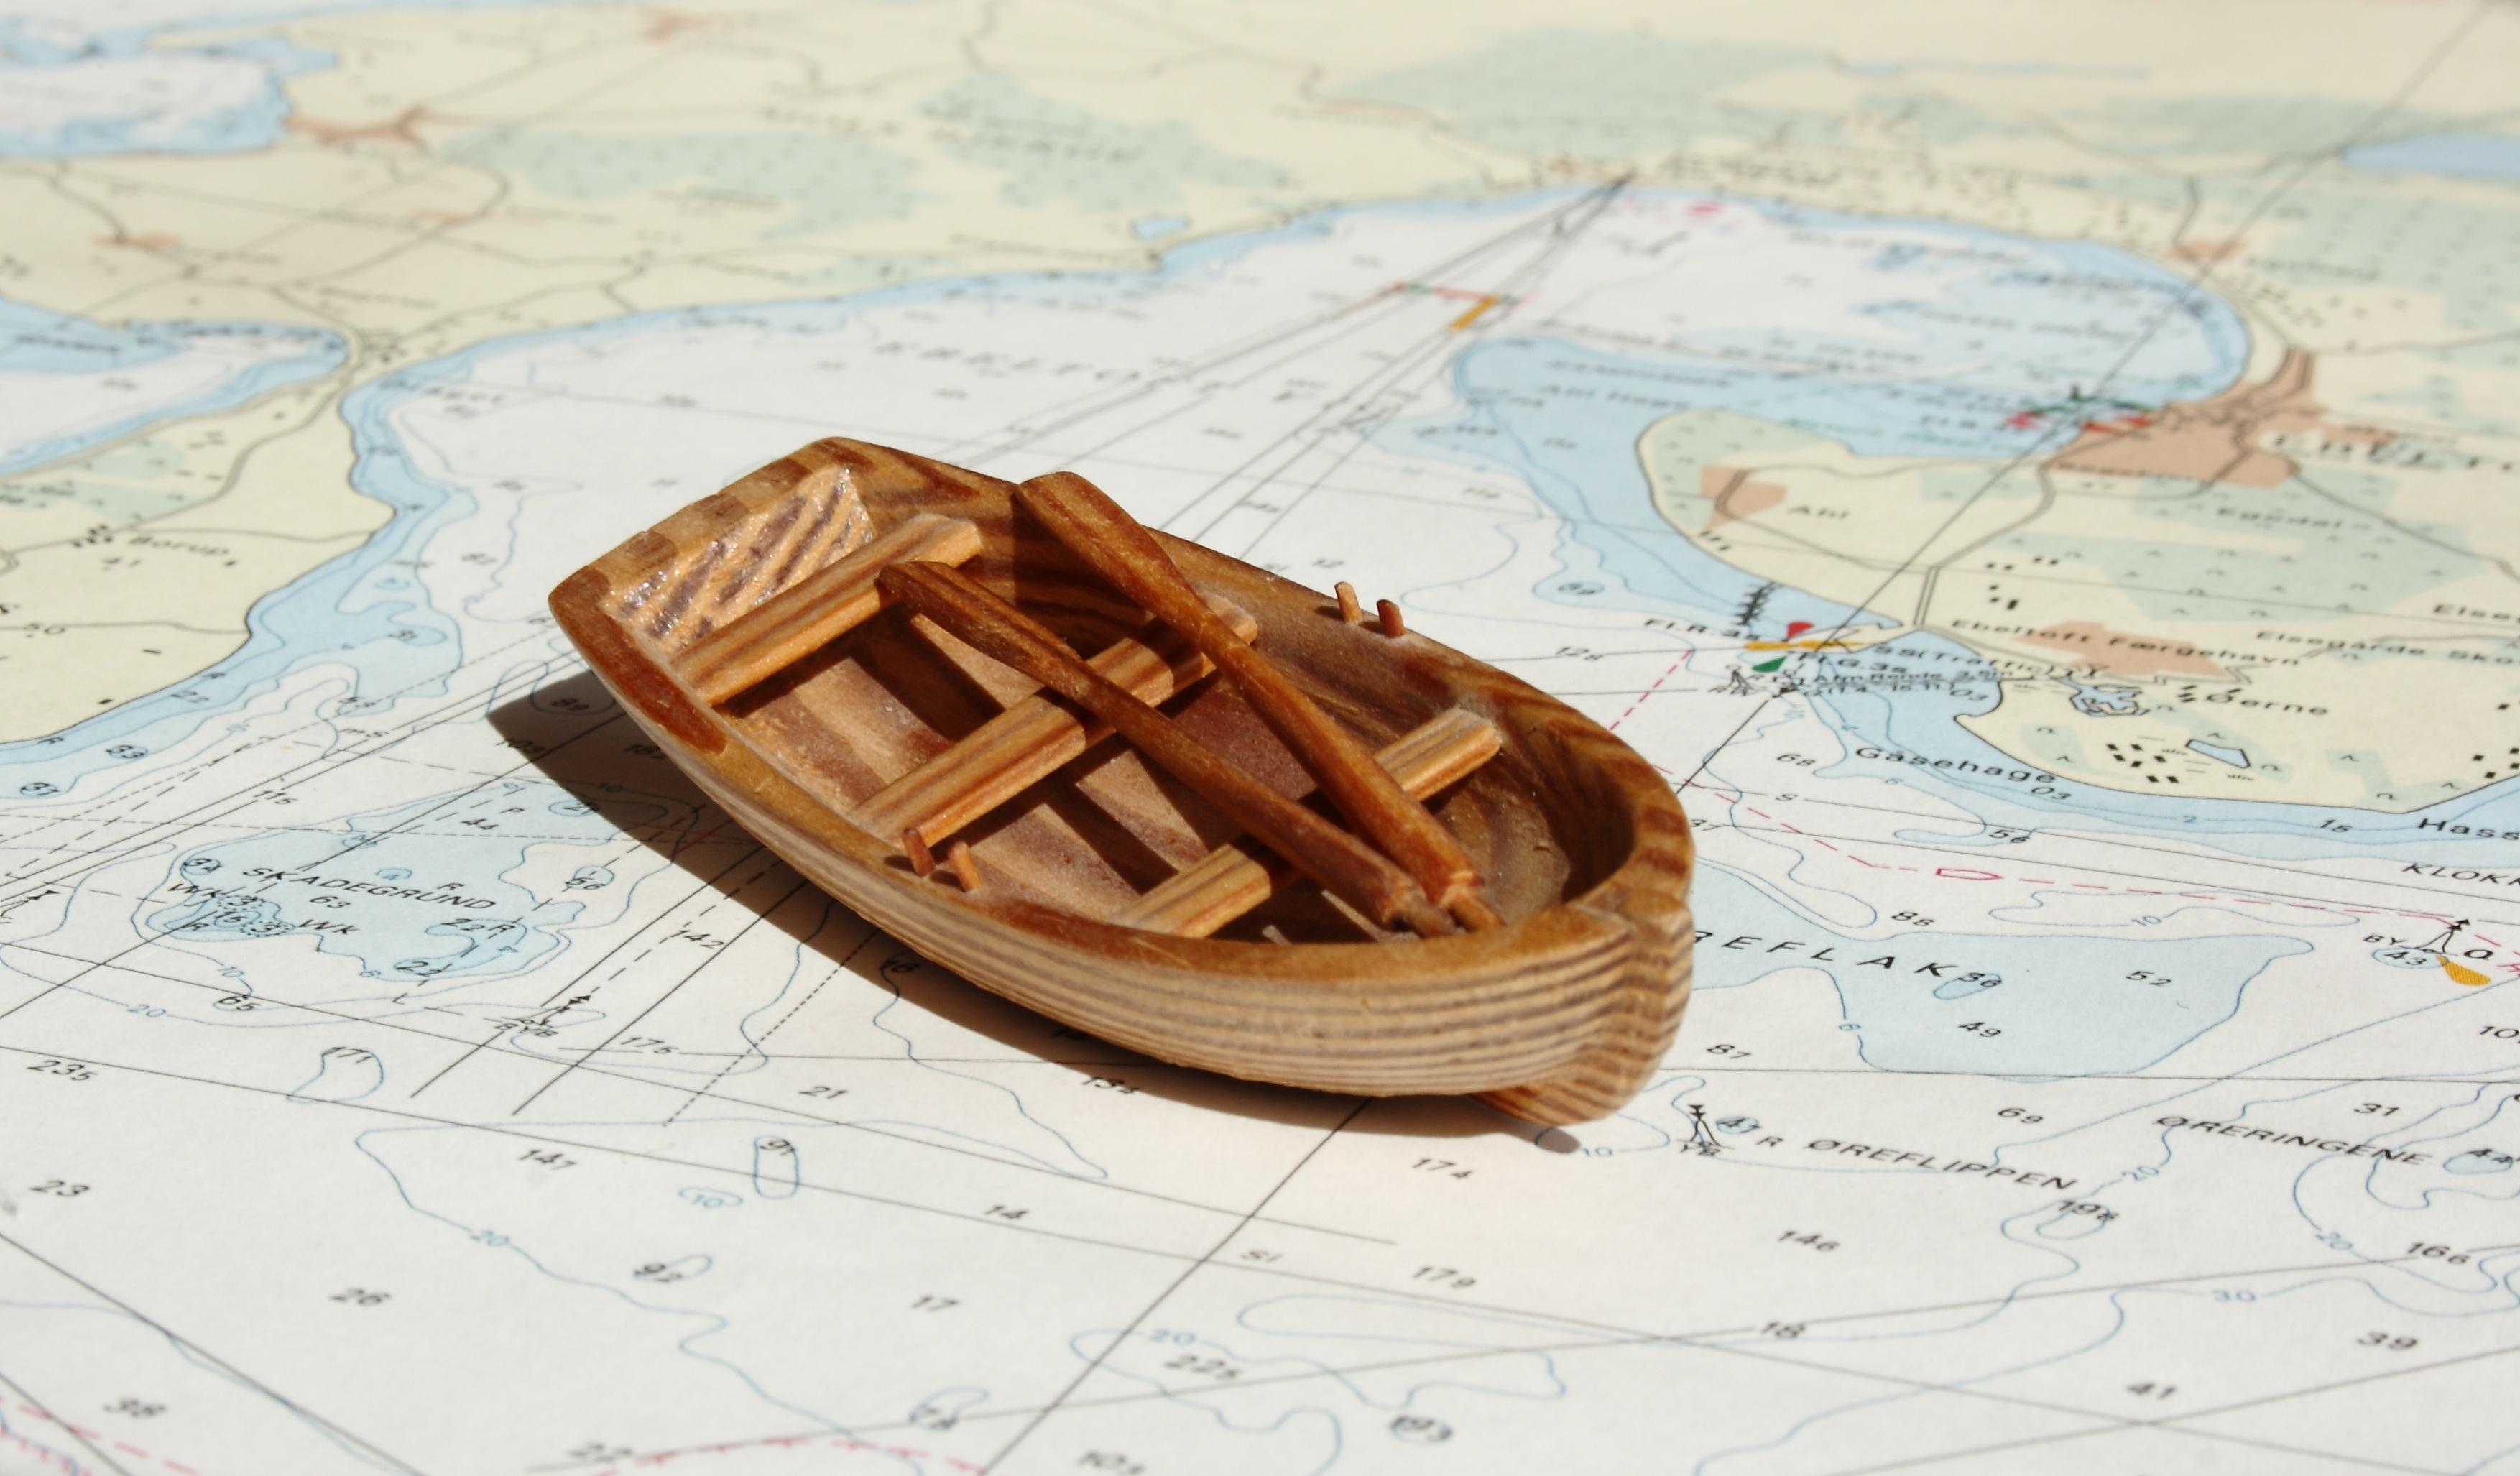 3507x2054 Free Images Wood, Boat, Chart, Model Ship, Art, Sketch, Drawing